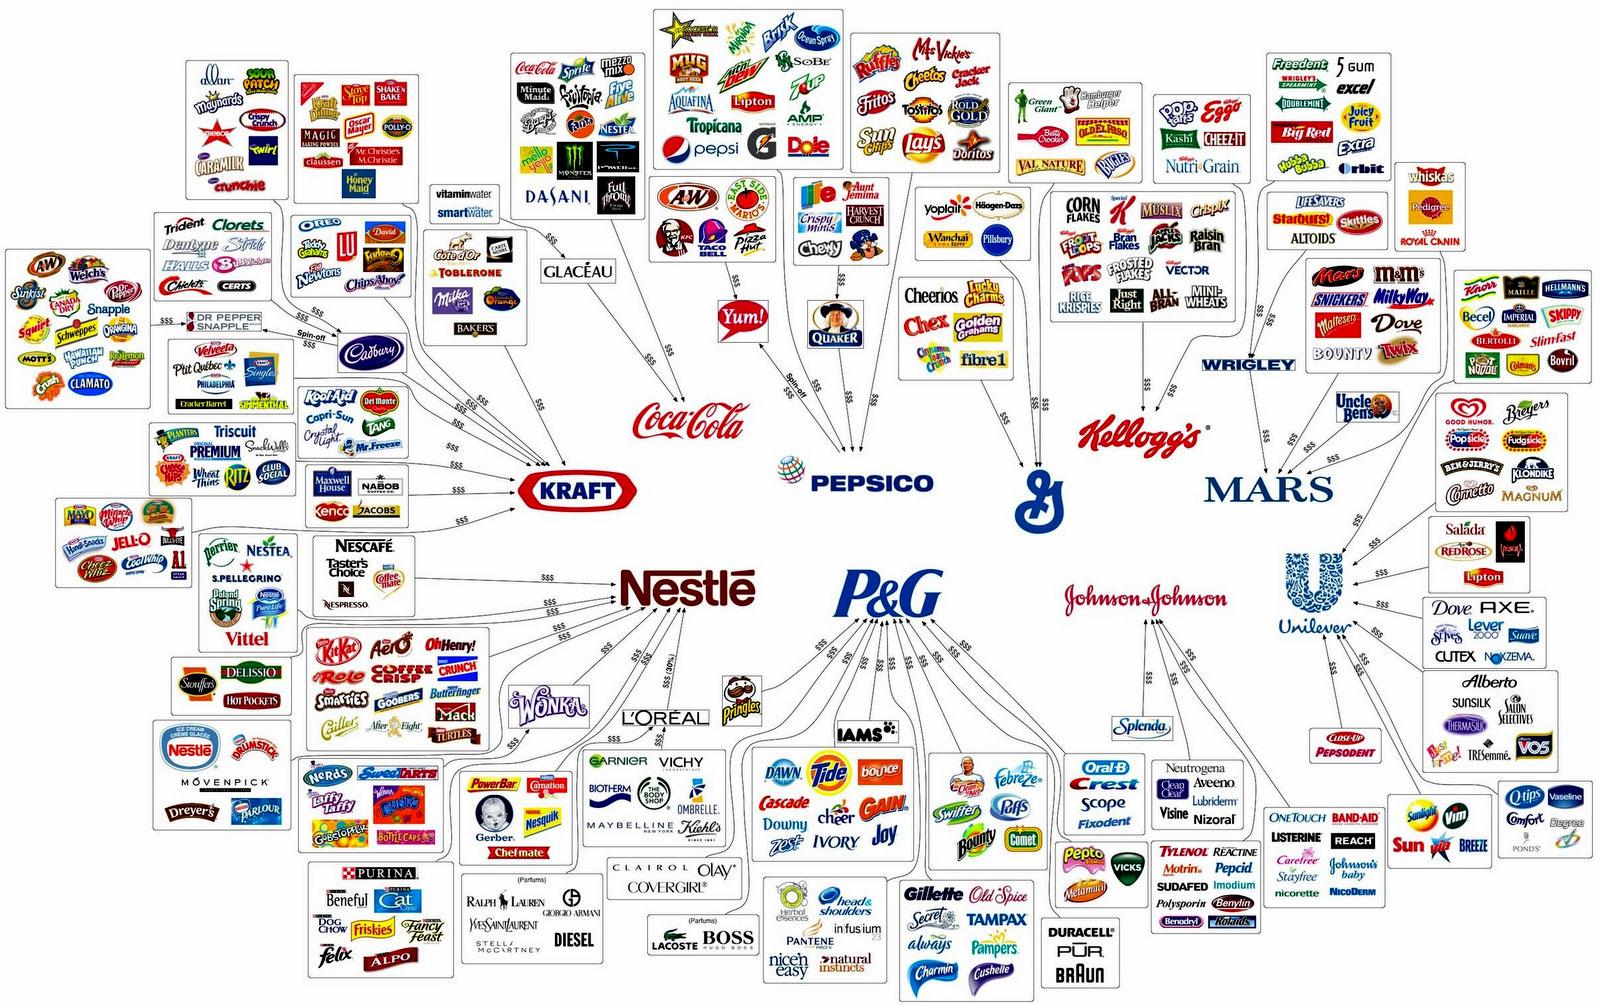 Rede de Controle Corporativo Global